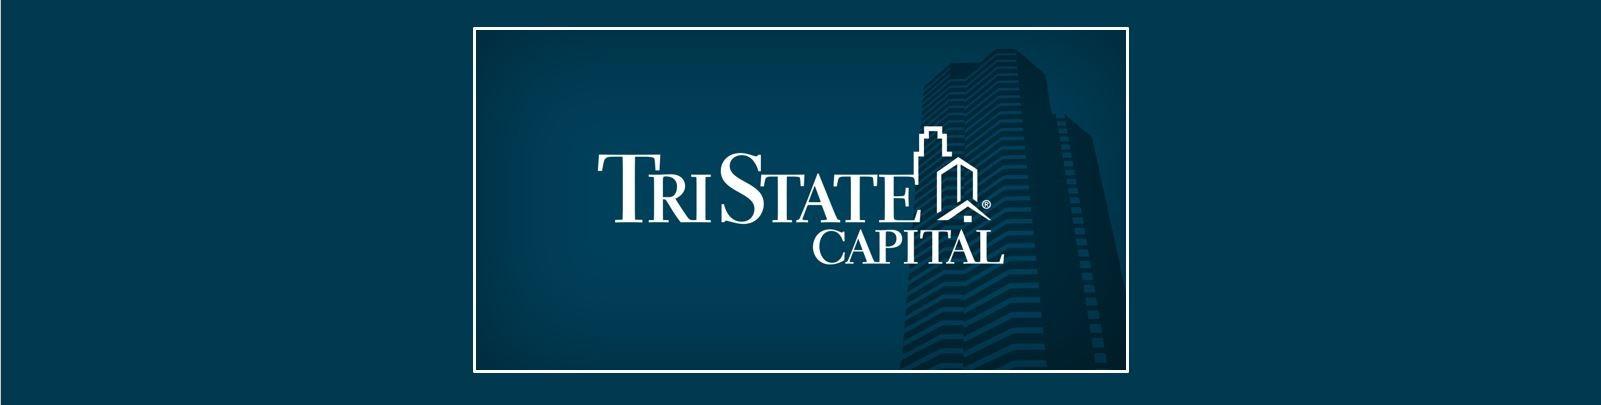 TriState Capital Bank | LinkedIn